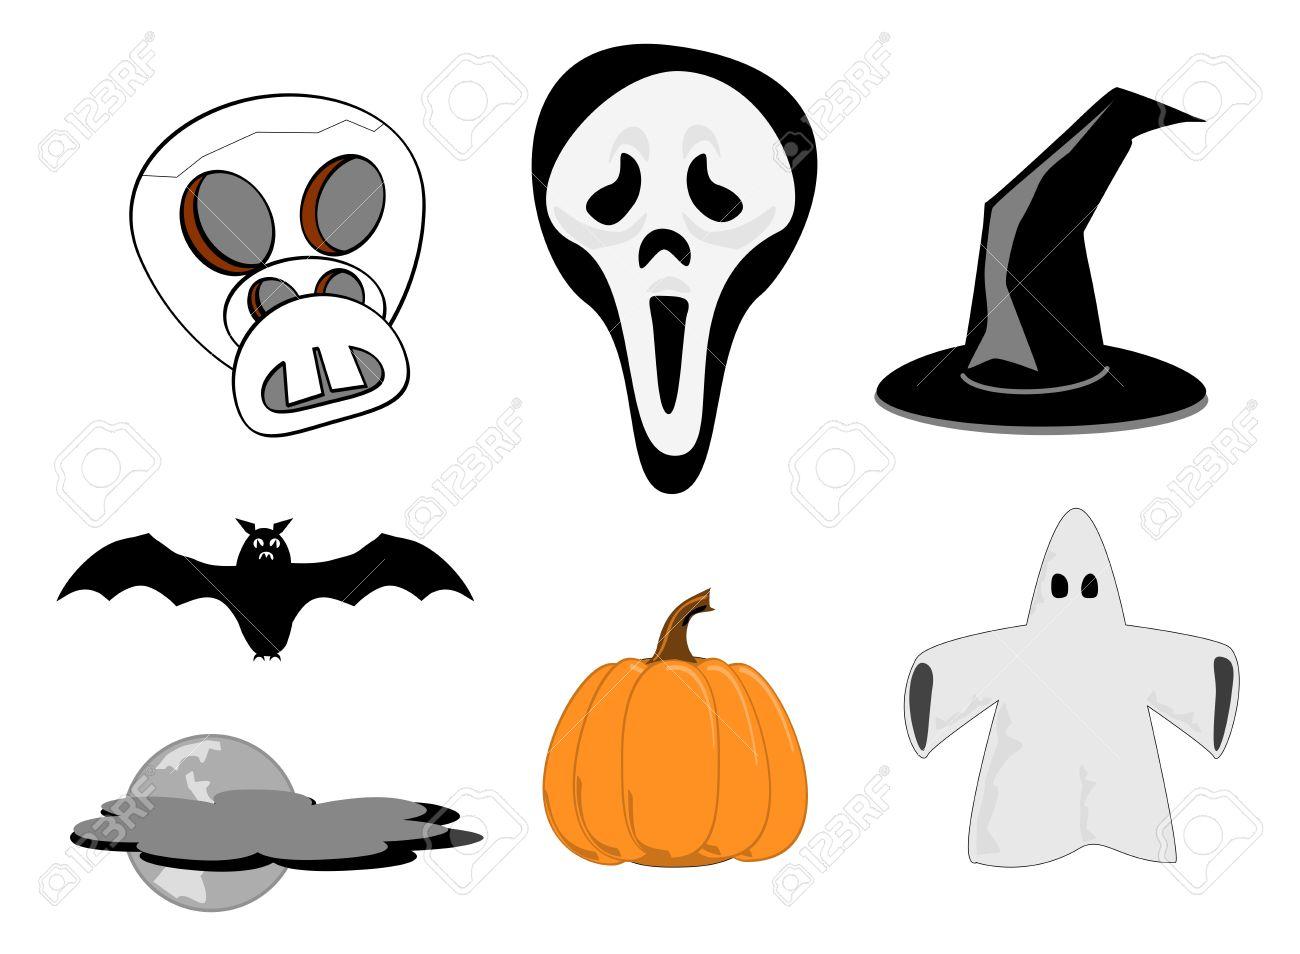 Halloween Clipart Skull Screm Mask Witches Hat Bat Pumpkin Moon.